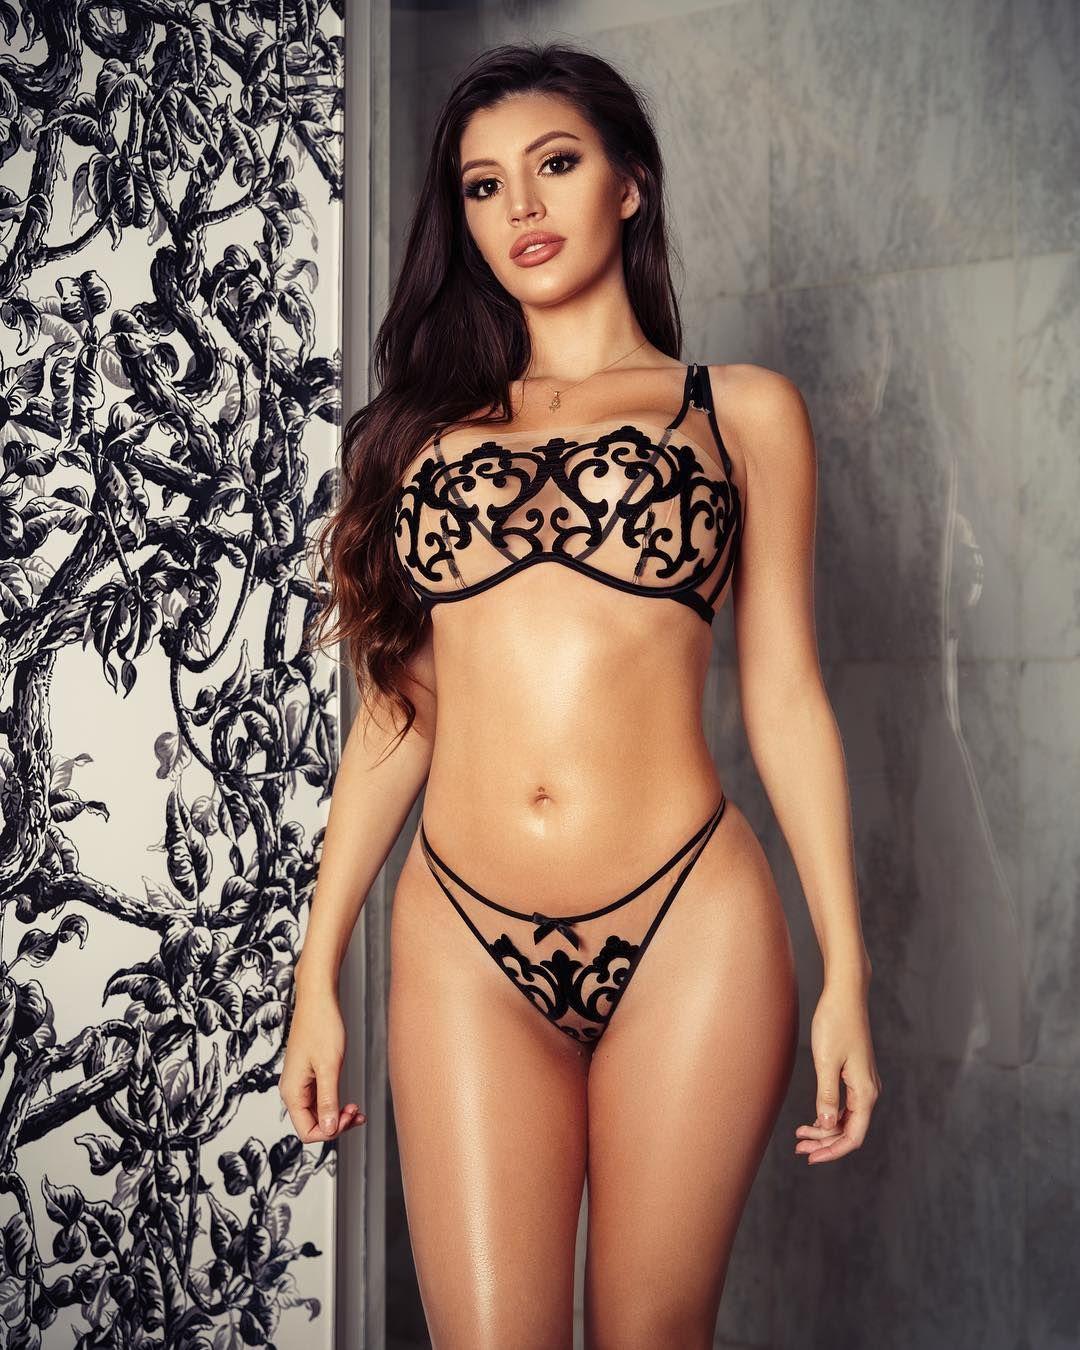 Celebrity Rosana Hernandez nudes (13 photo), Sexy, Leaked, Instagram, braless 2020